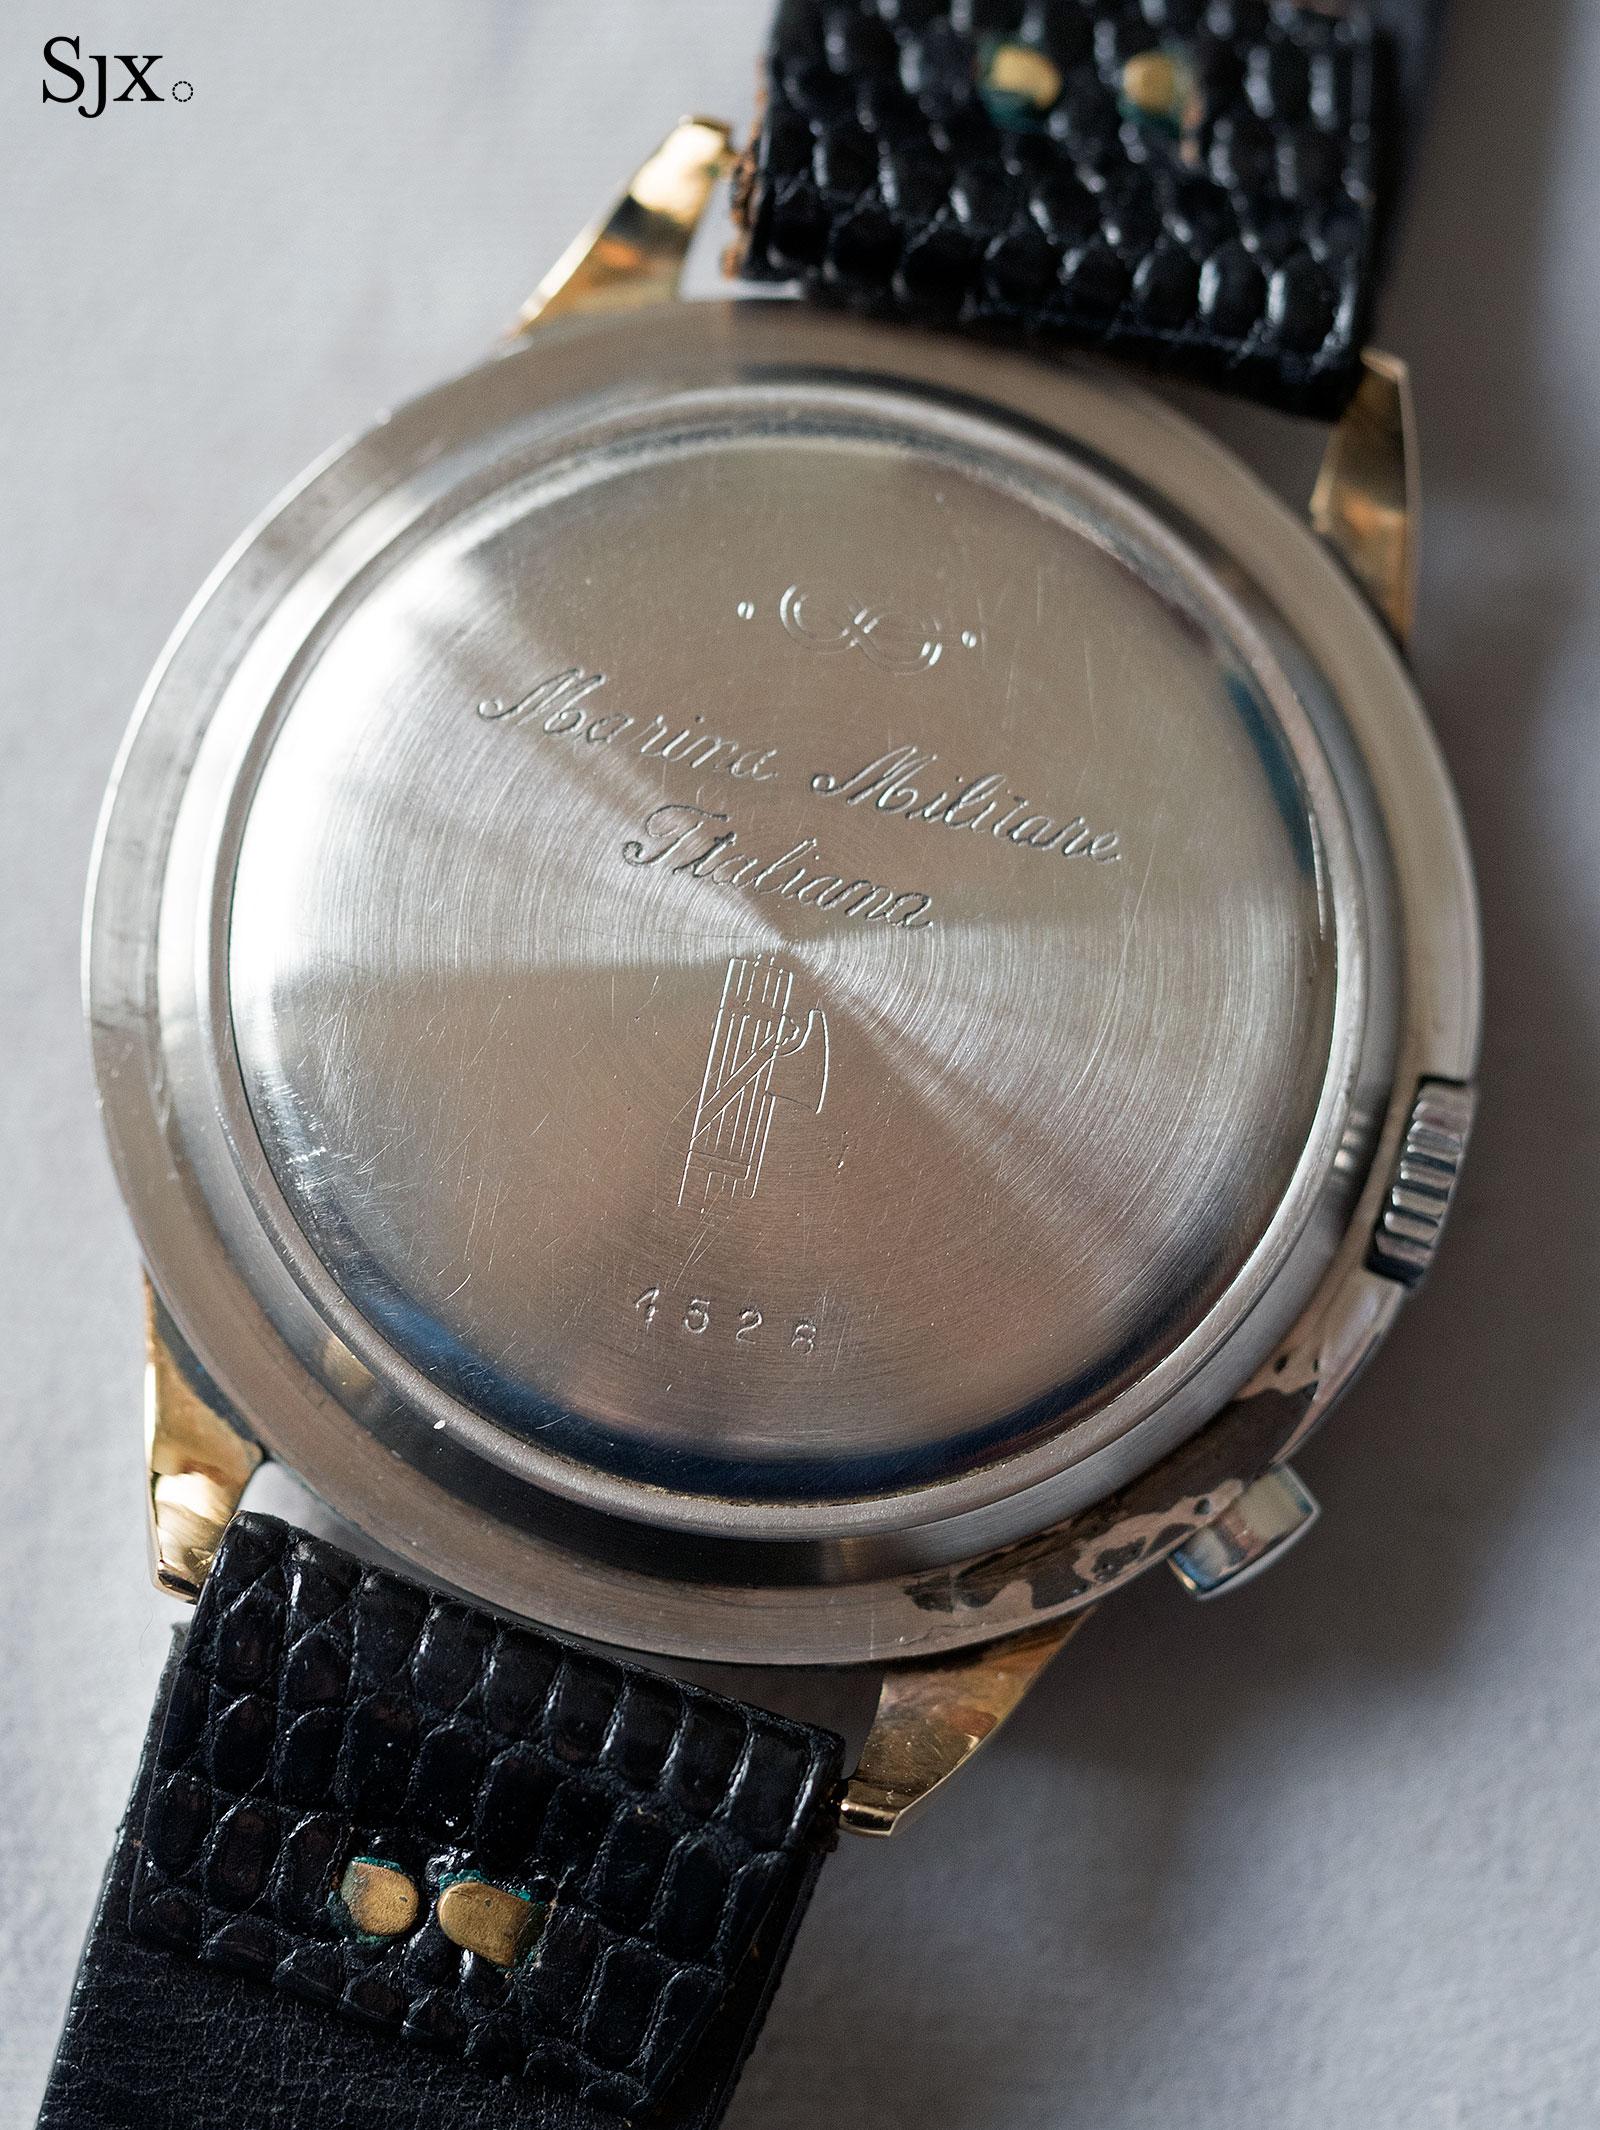 Zenith 4528 Marina Militare chronograph 6